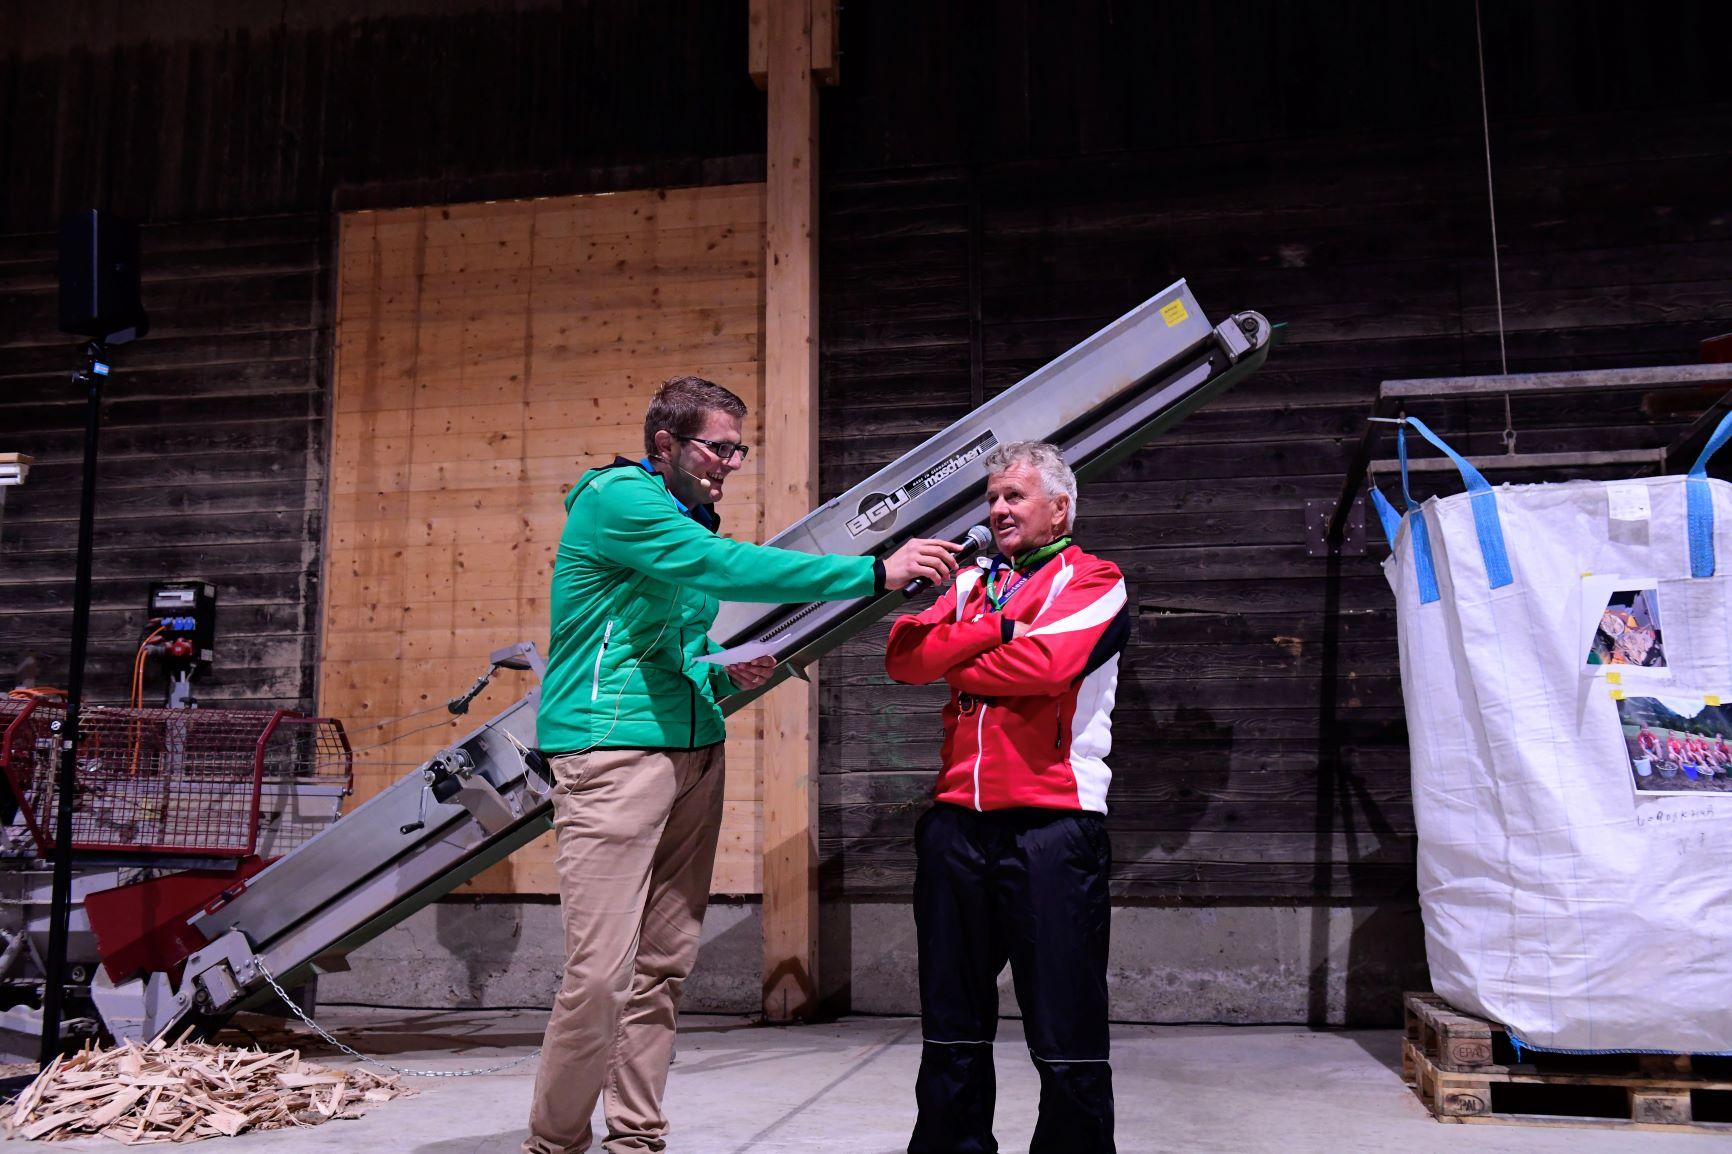 Schwander Gwärb ist Namenspatron der Biathlon Trainingsanlage im Pfedli in Giswil